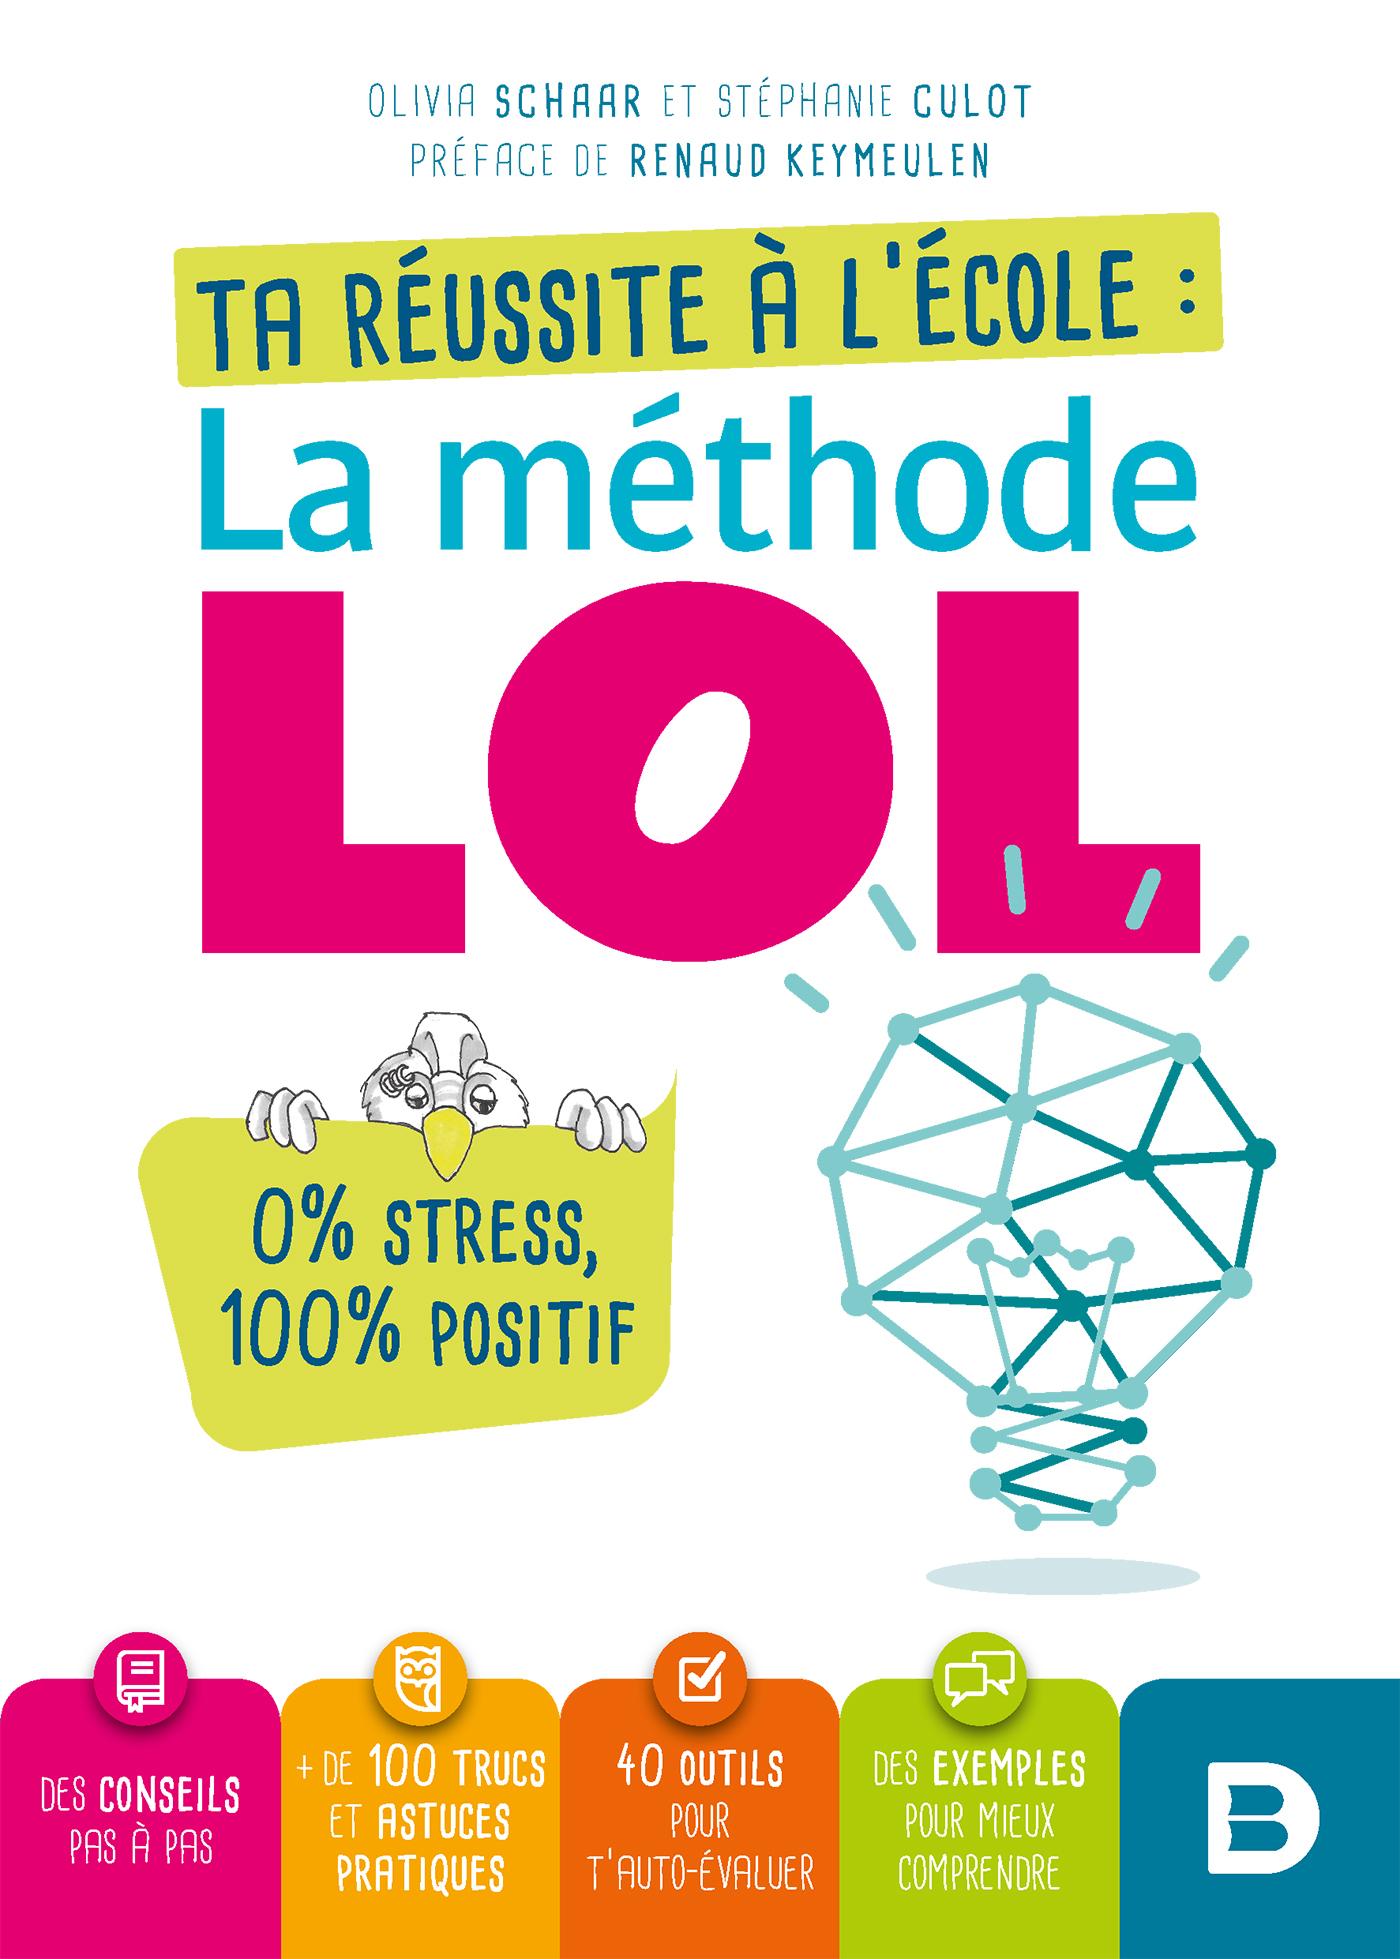 TA REUSSITE A L'ECOLE - LA METHODE LOL